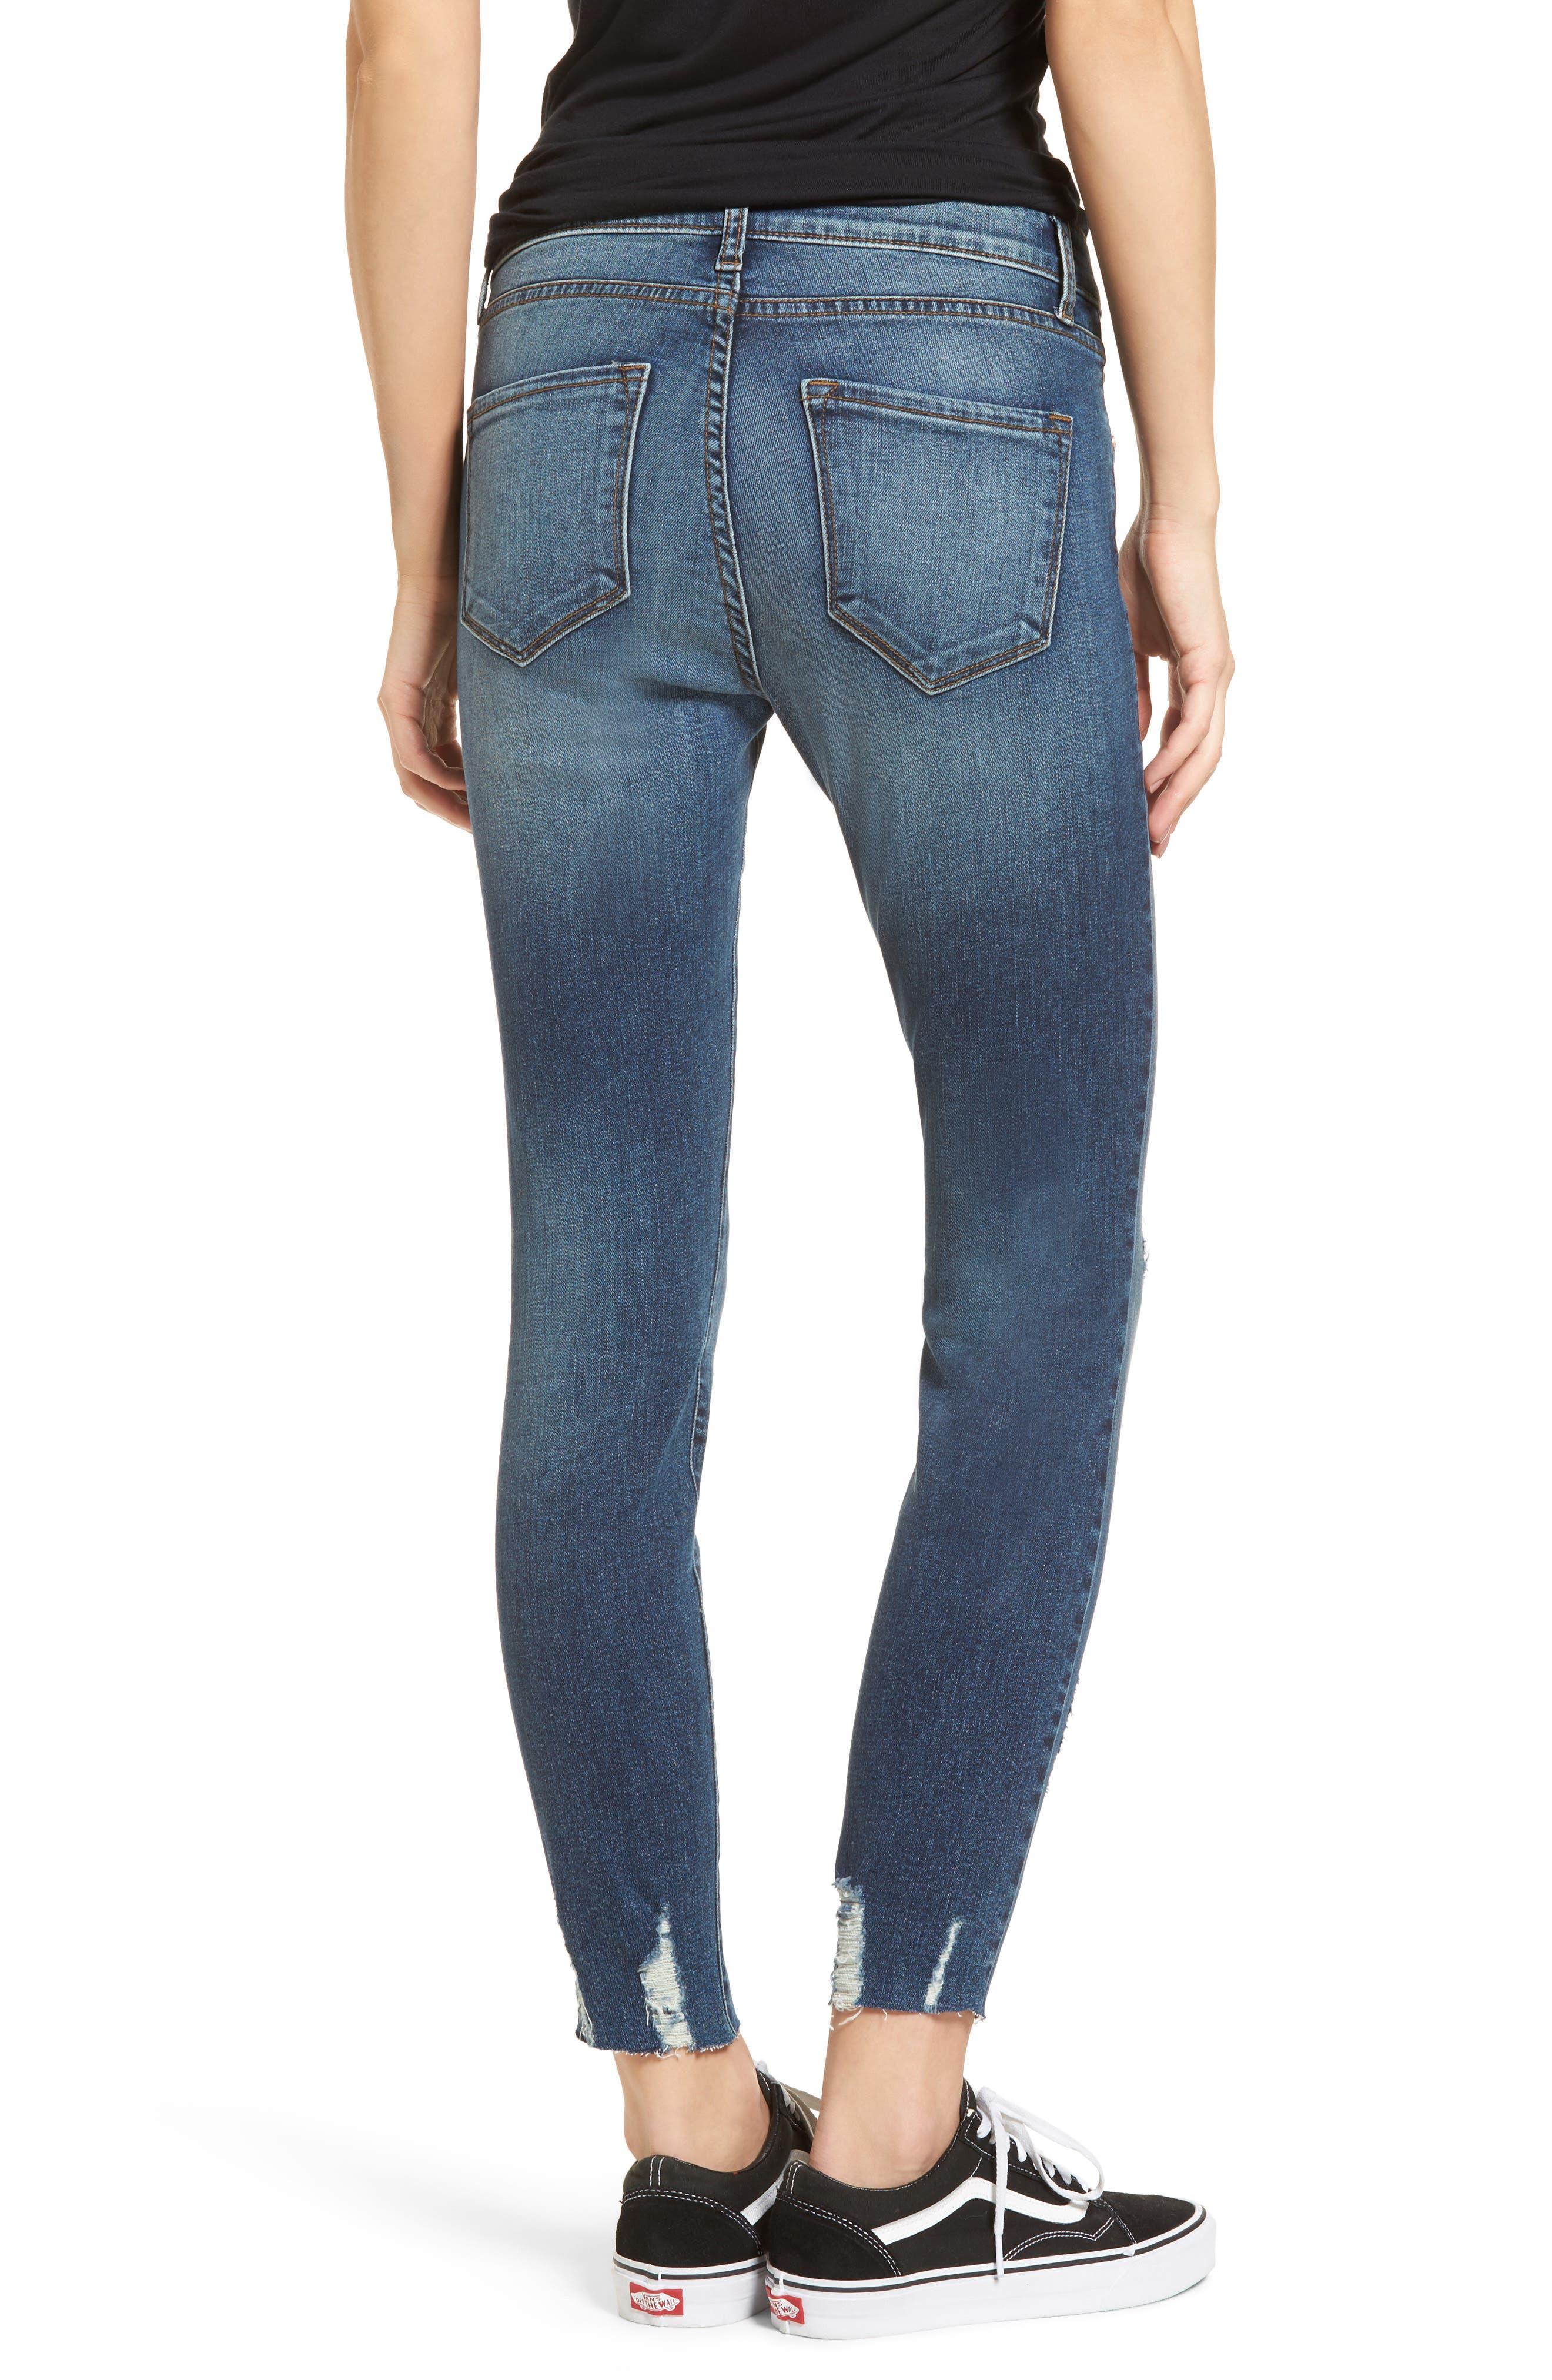 Decon Distressed Skinny Jeans,                             Alternate thumbnail 2, color,                             Vintage